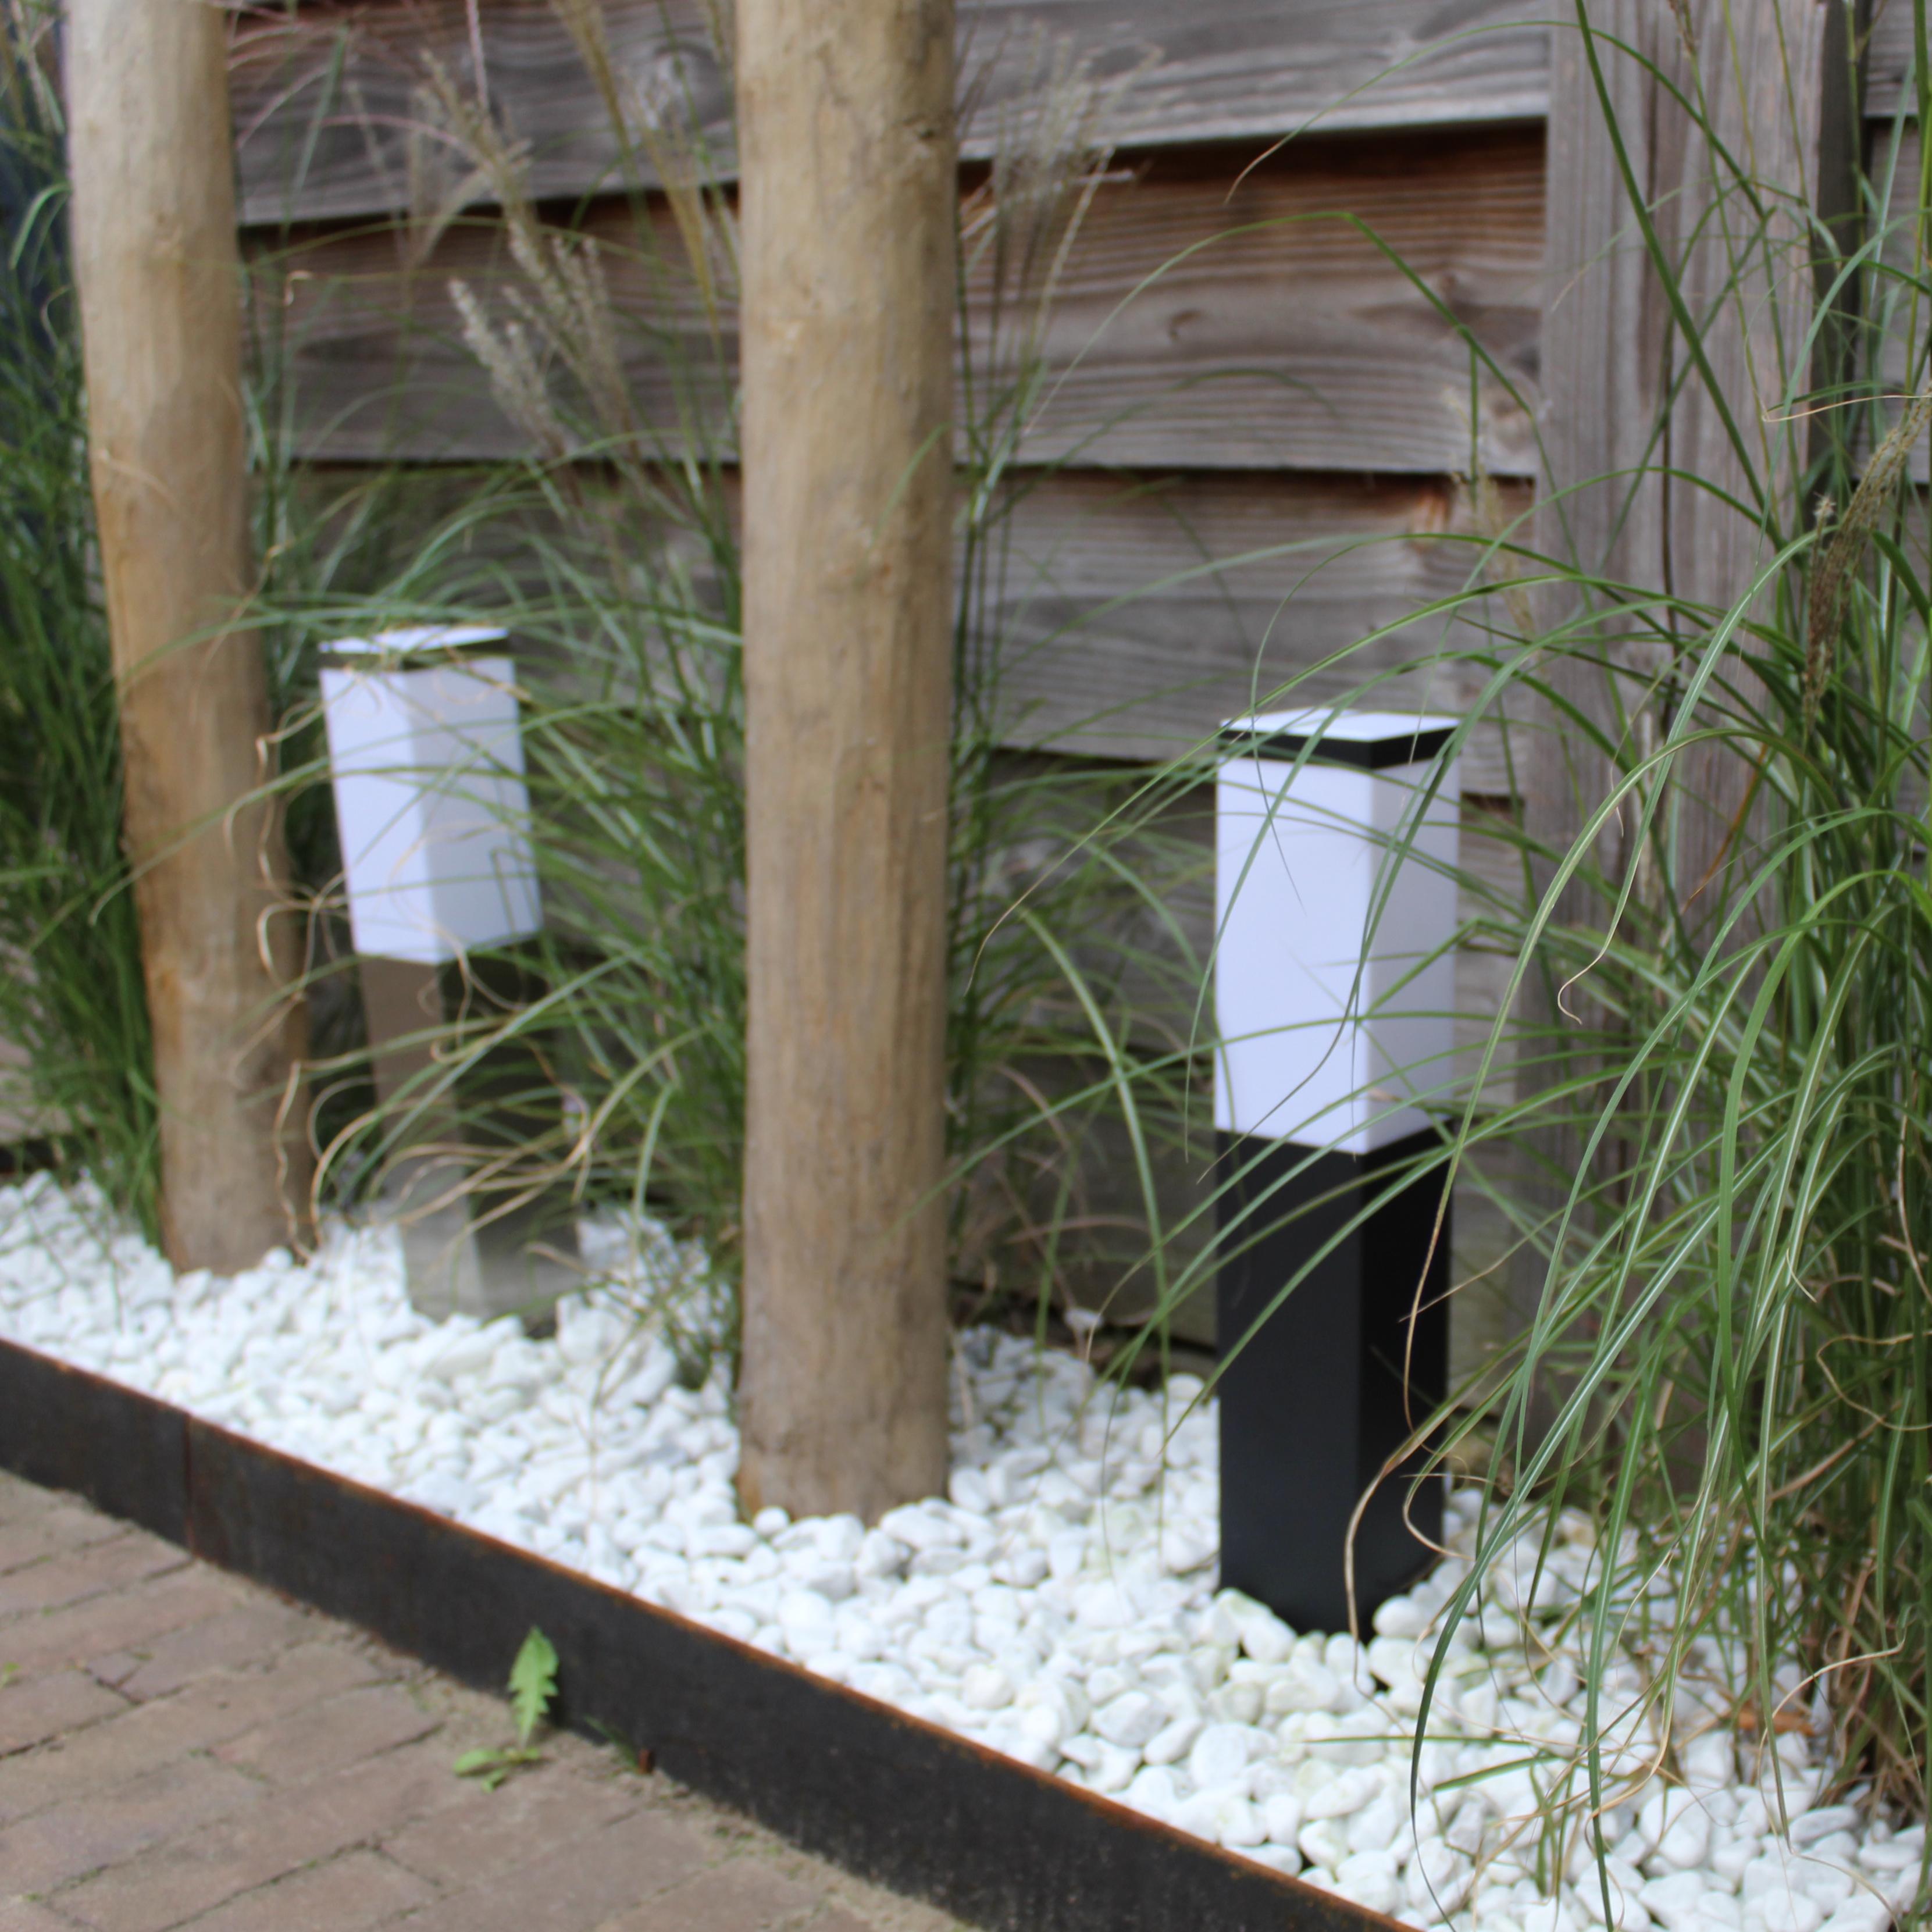 Moderne tuinpaal - staande buitenlamp - zwart en aluminium look - 45cm - IP44 - sfeerfoto